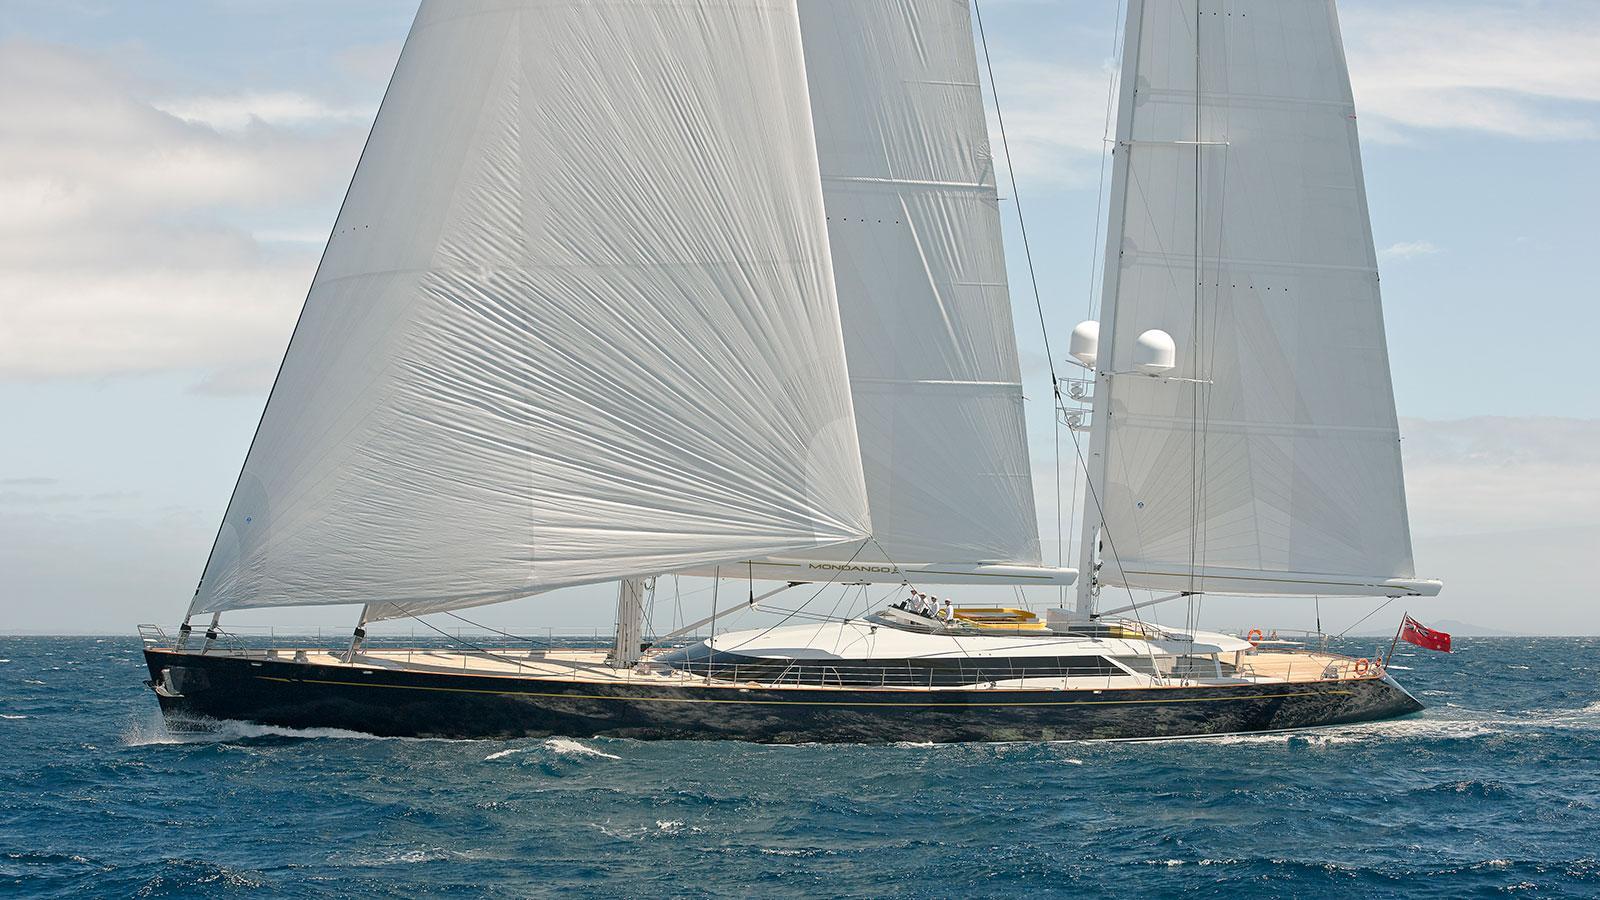 mondango-3-super-yacht-sailing-boat